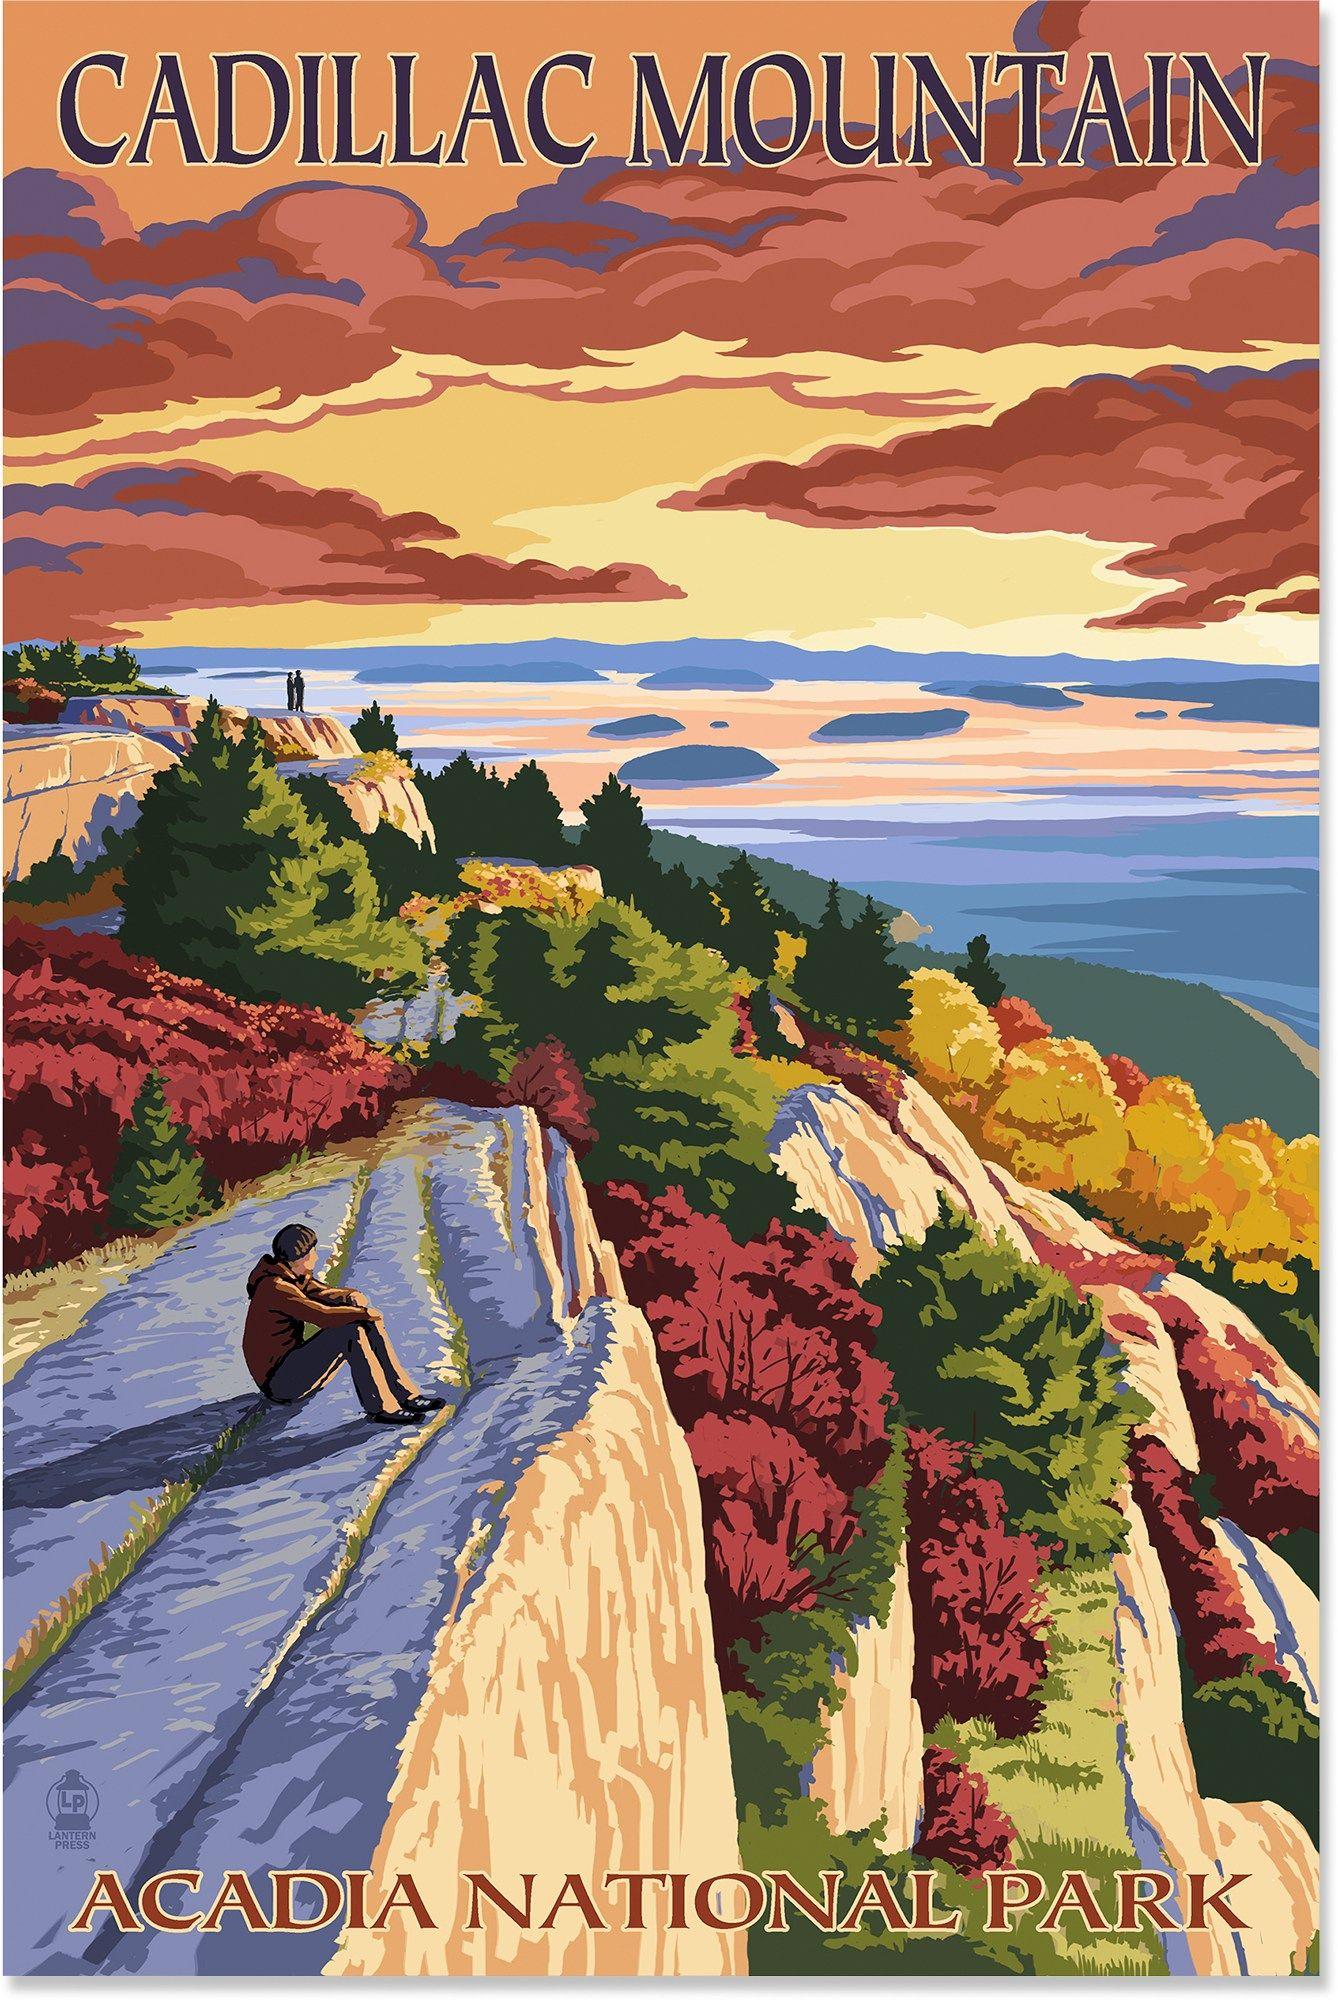 Color art printing anchorage - Lantern Press Acadia National Park Cadillac Mountain Art Print 12